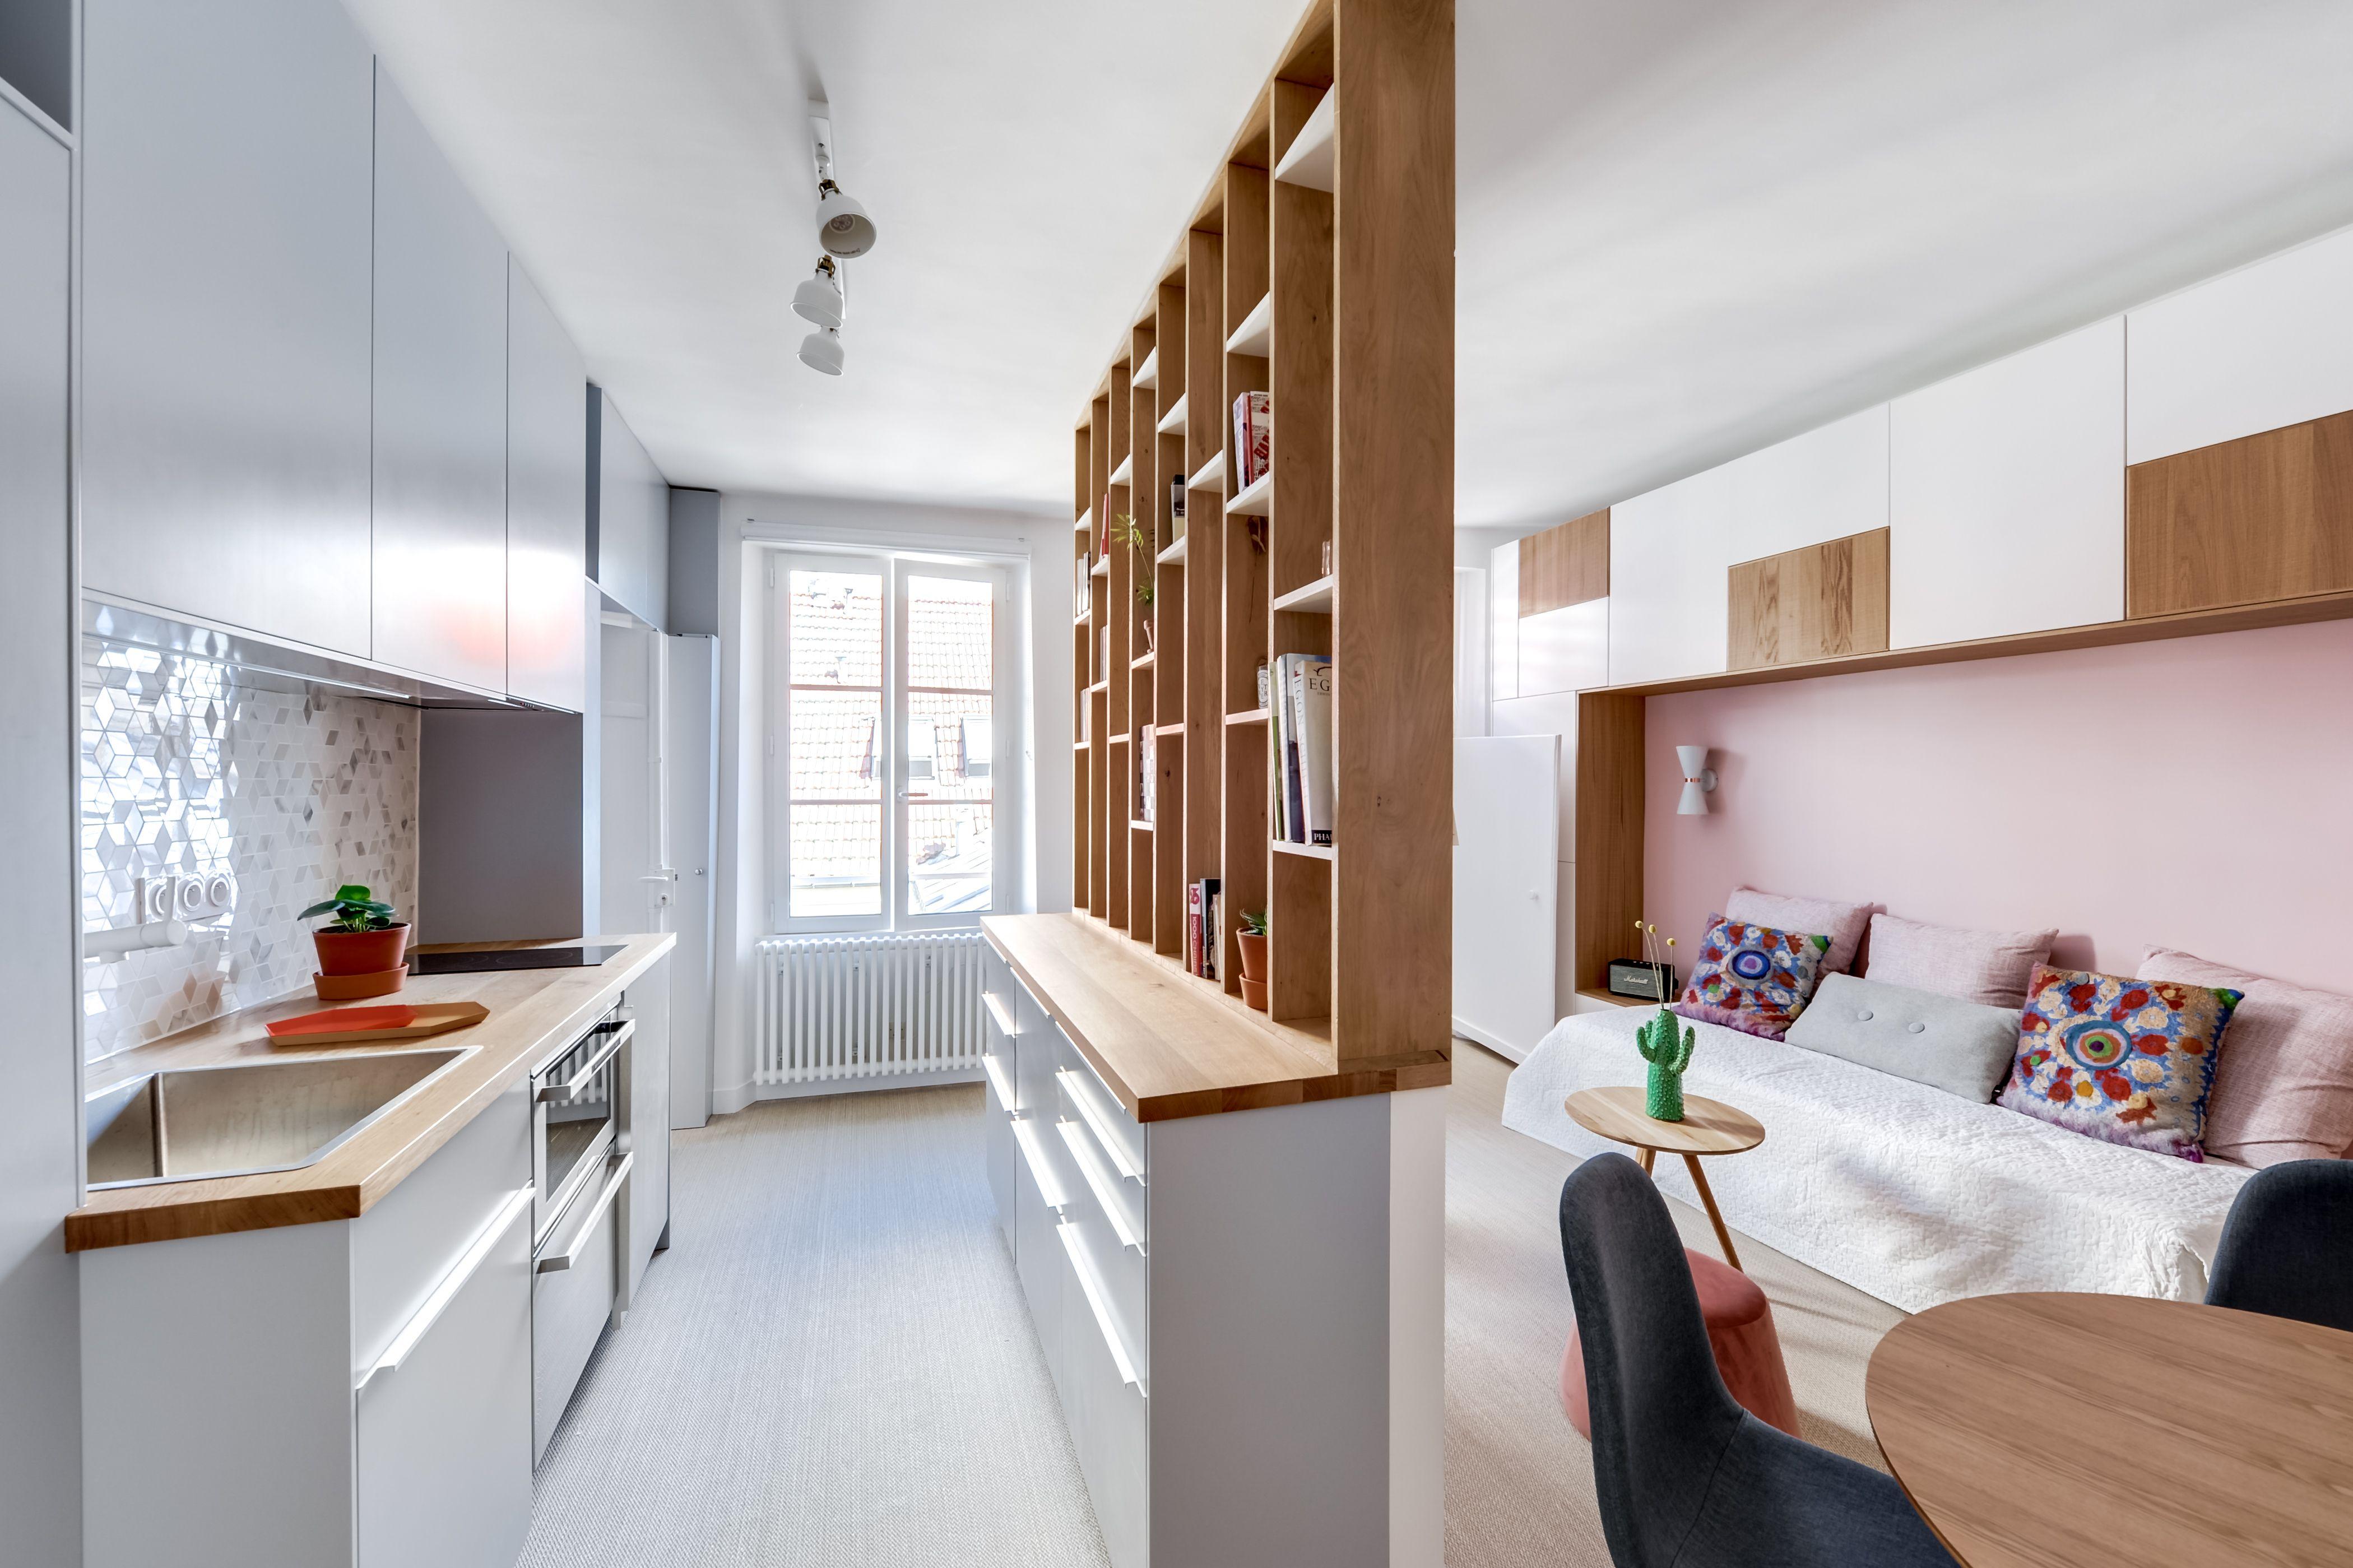 cuisine salle manger salon rnovation complte dun appartement de 28